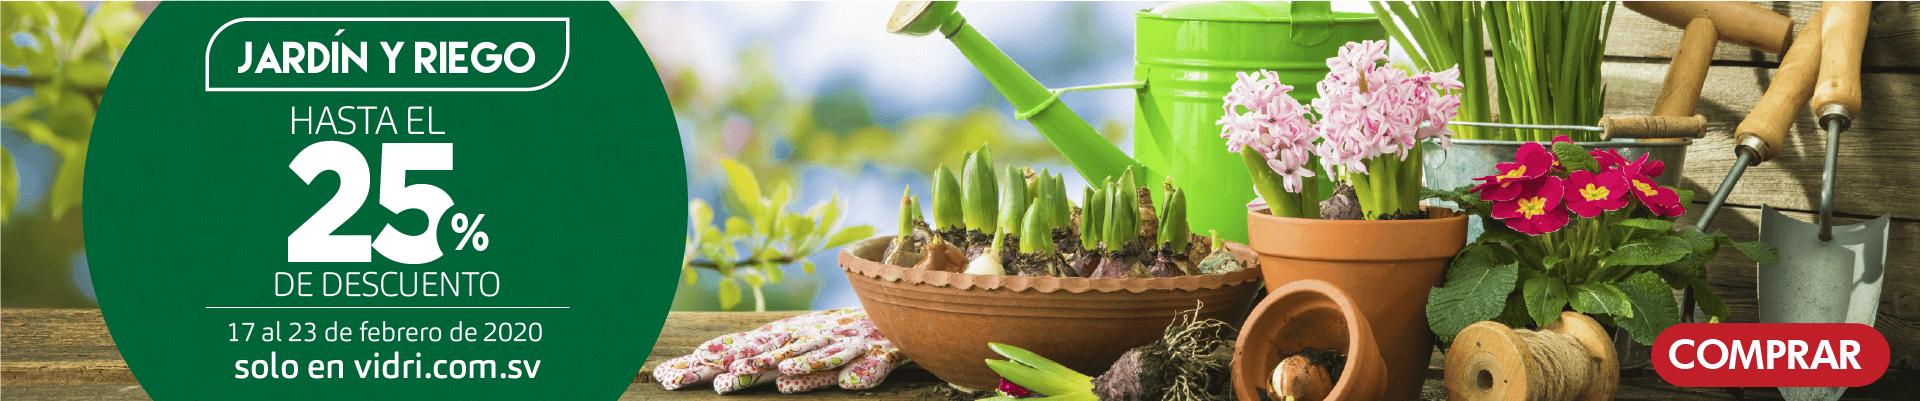 Jardin y riego